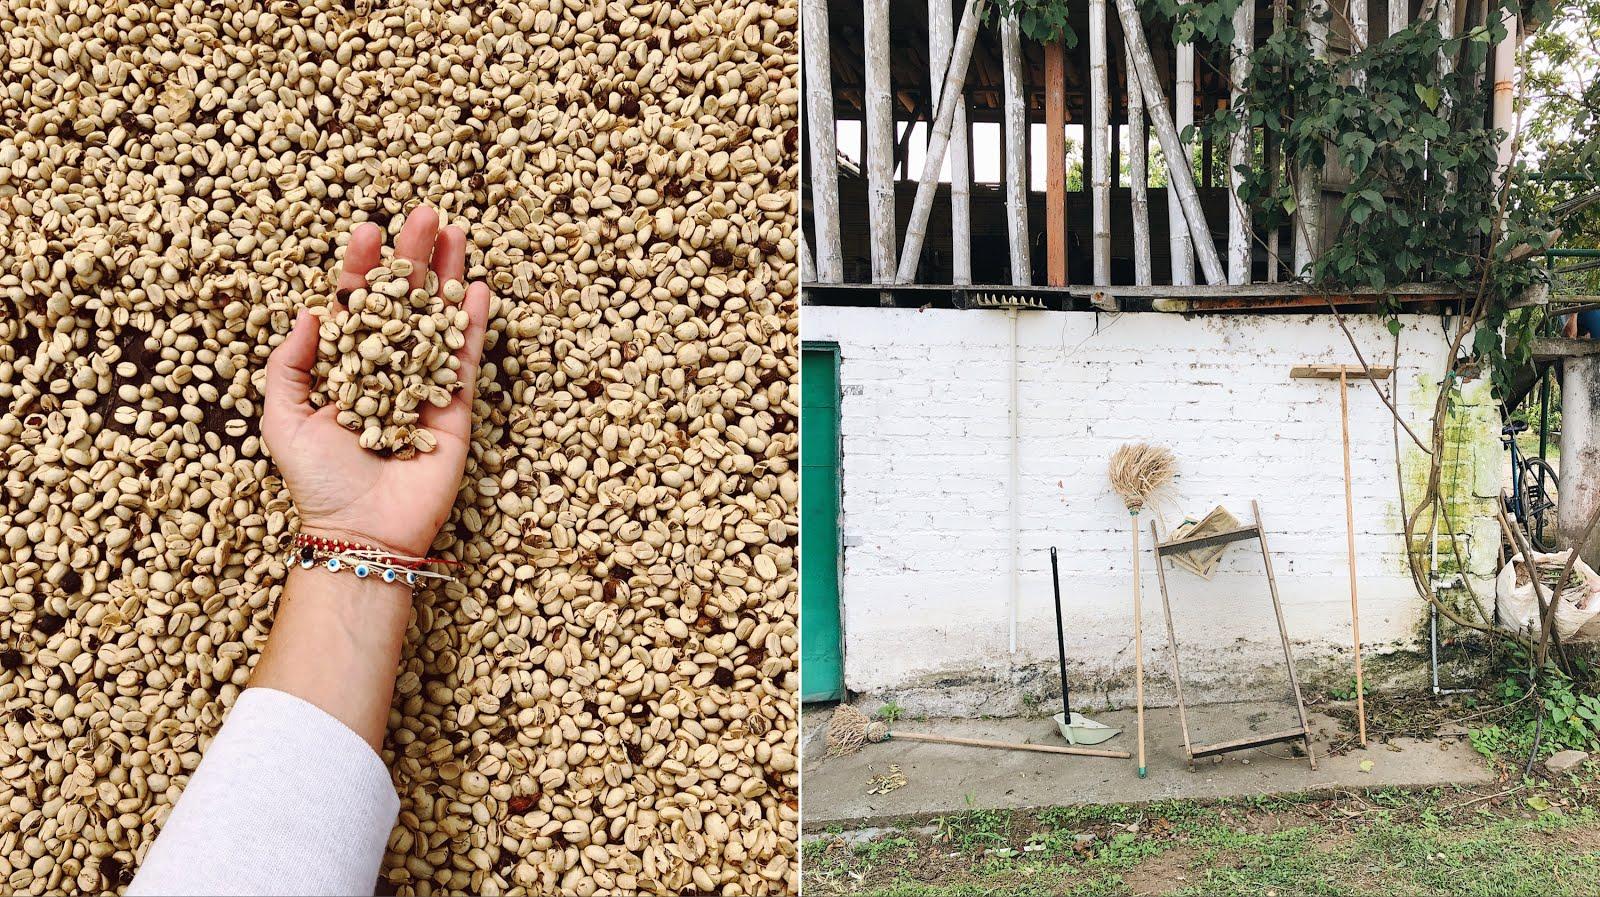 Arte Boheme, Arteboheme, Federica Molini, Visit Colombia, Visit Armenia, Finca Arauca, Colombia Travel, Armenia Colombia, Travel Colombia,  Colombia Coffee Region, Zona Cafetera colombia